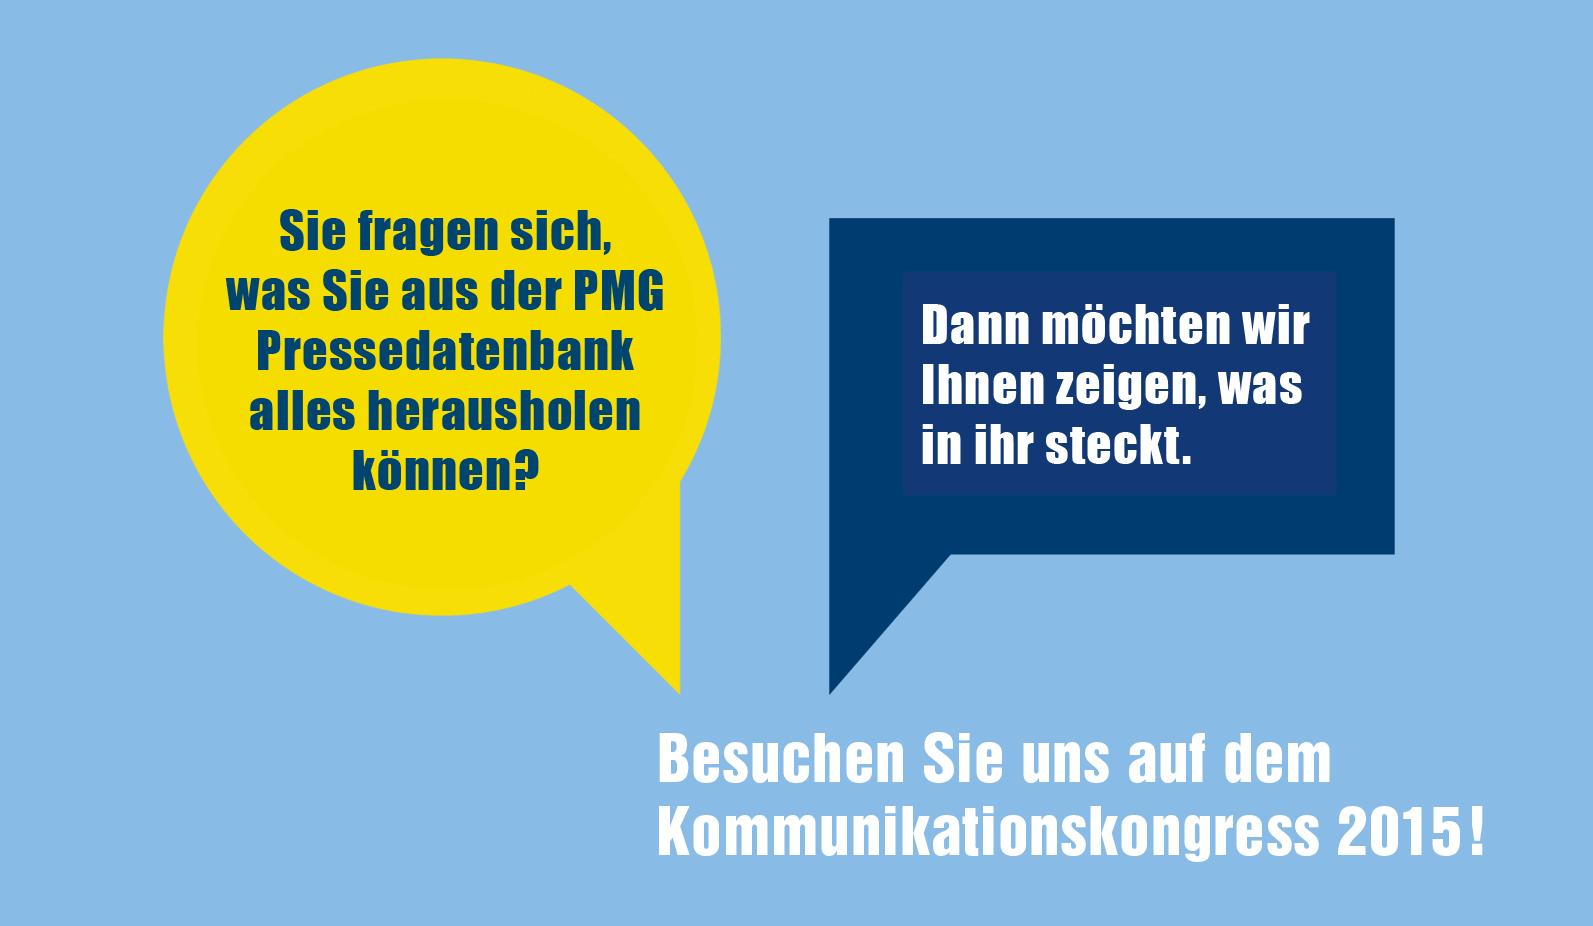 PMG auf dem Kommunikationskongress 2015